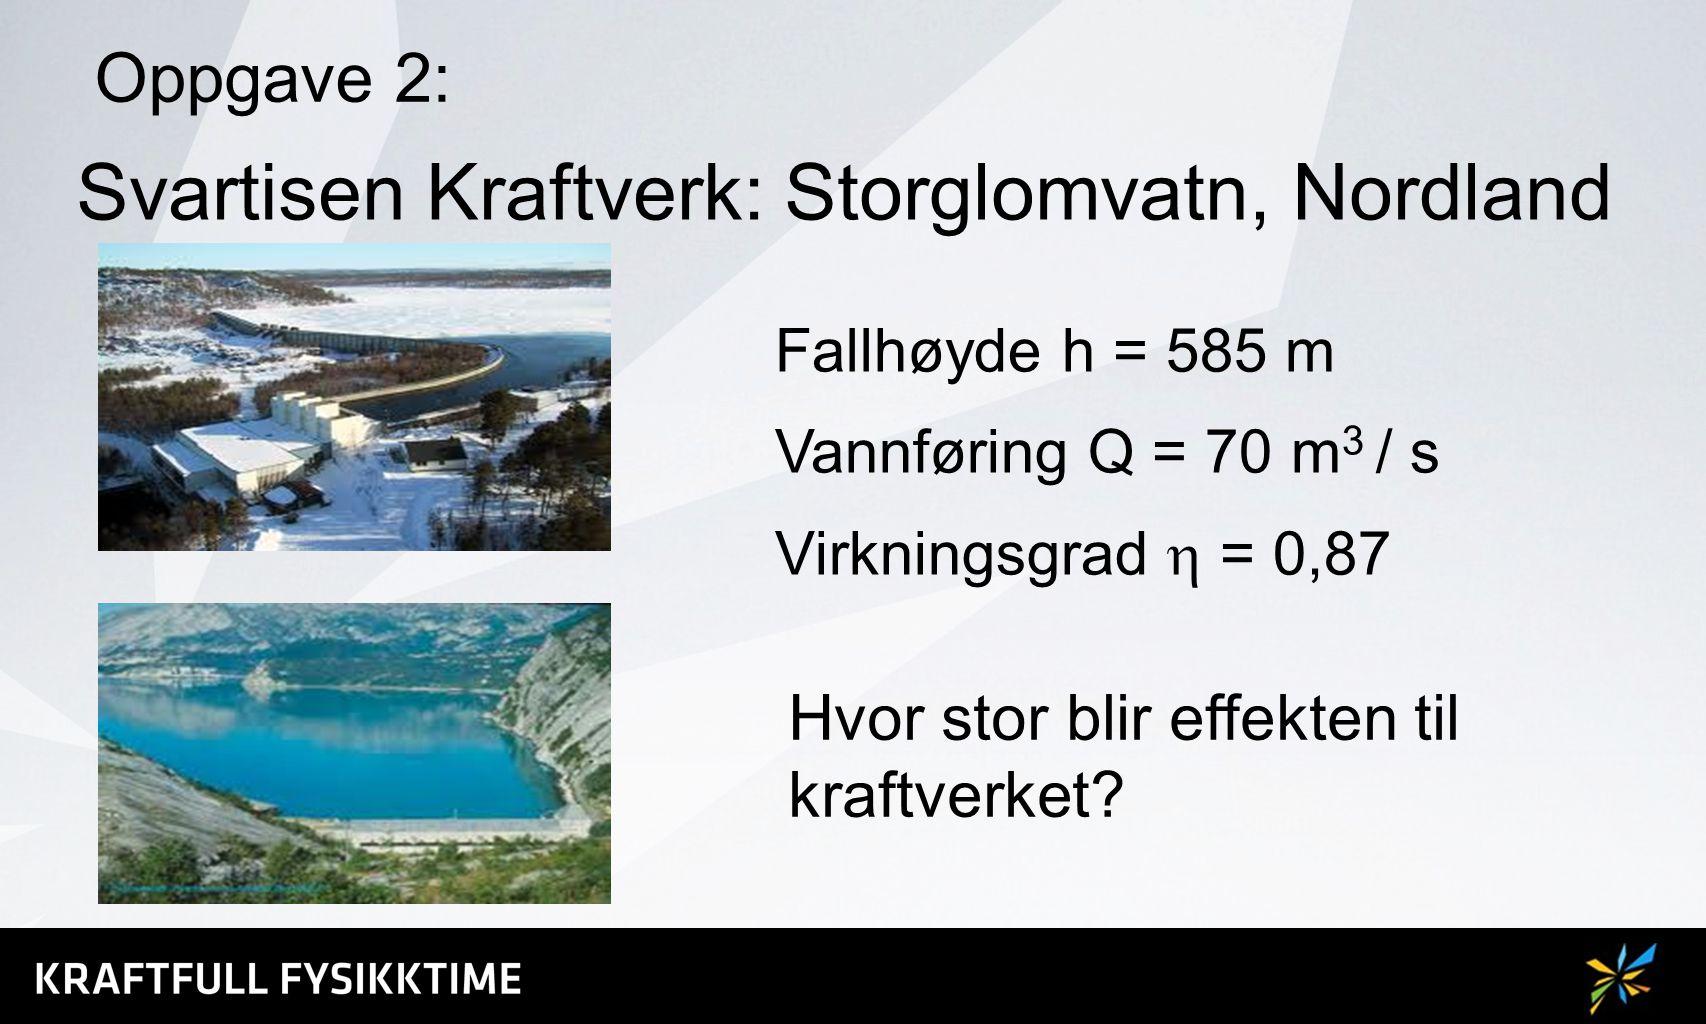 Svartisen Kraftverk: Storglomvatn, Nordland